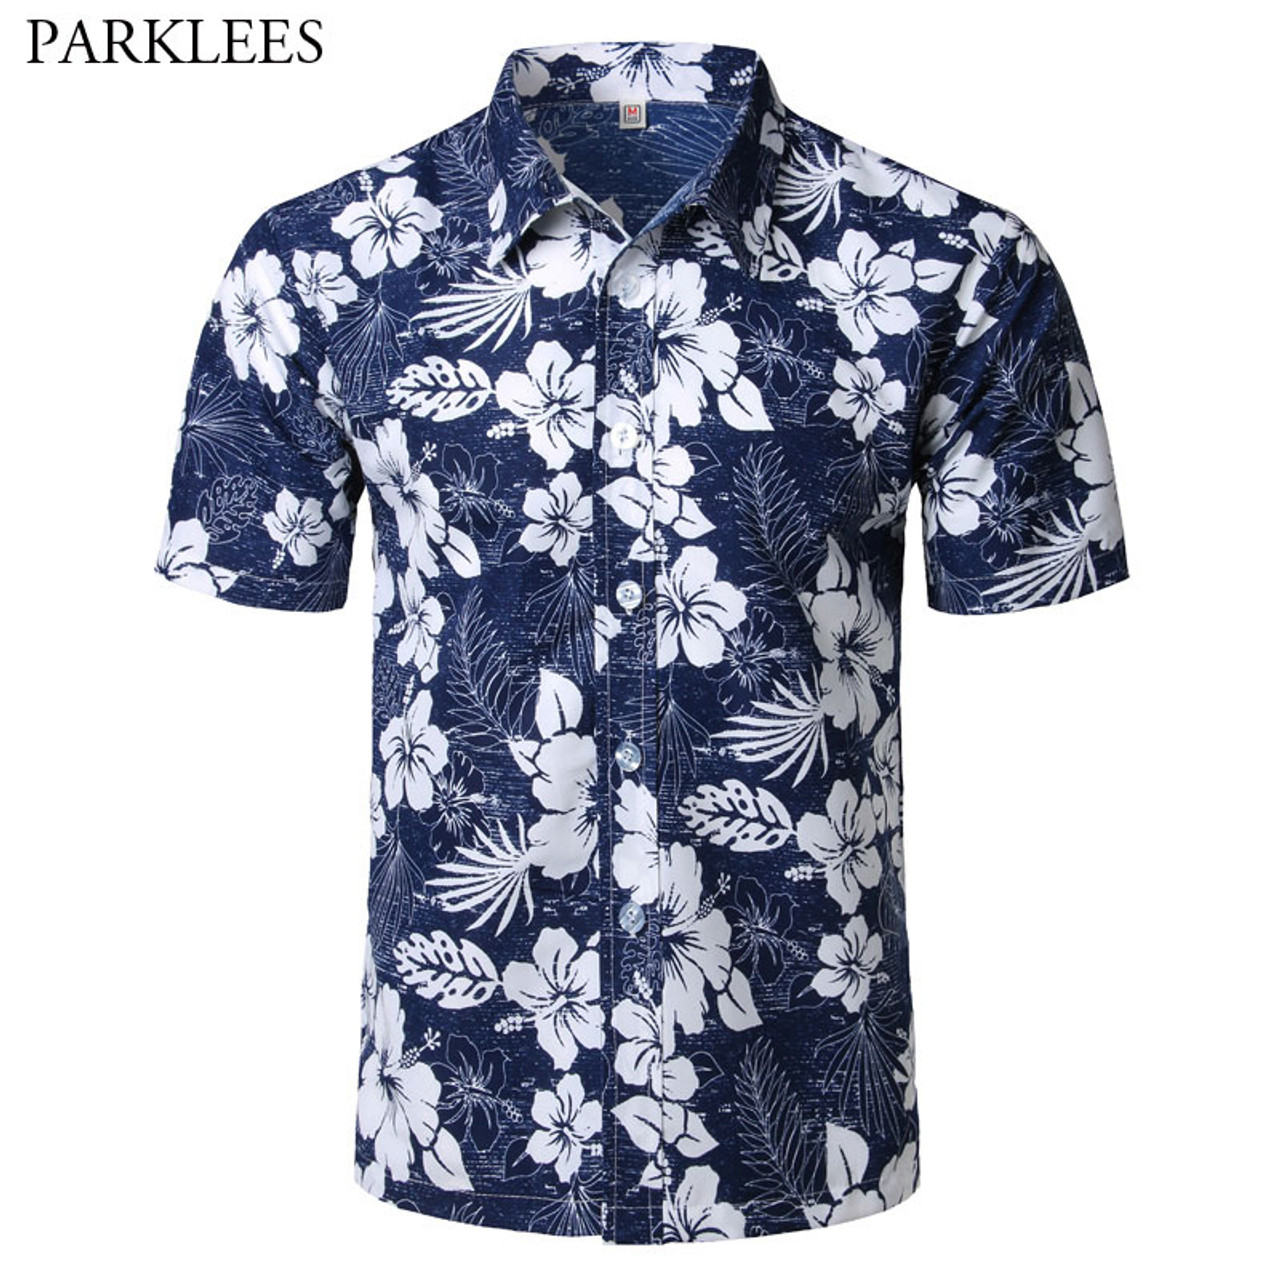 Floral Shirt Men Summer Print Turn-Down Collar Slim Fit Short Sleeve Top Shirt Blouse Men 2019